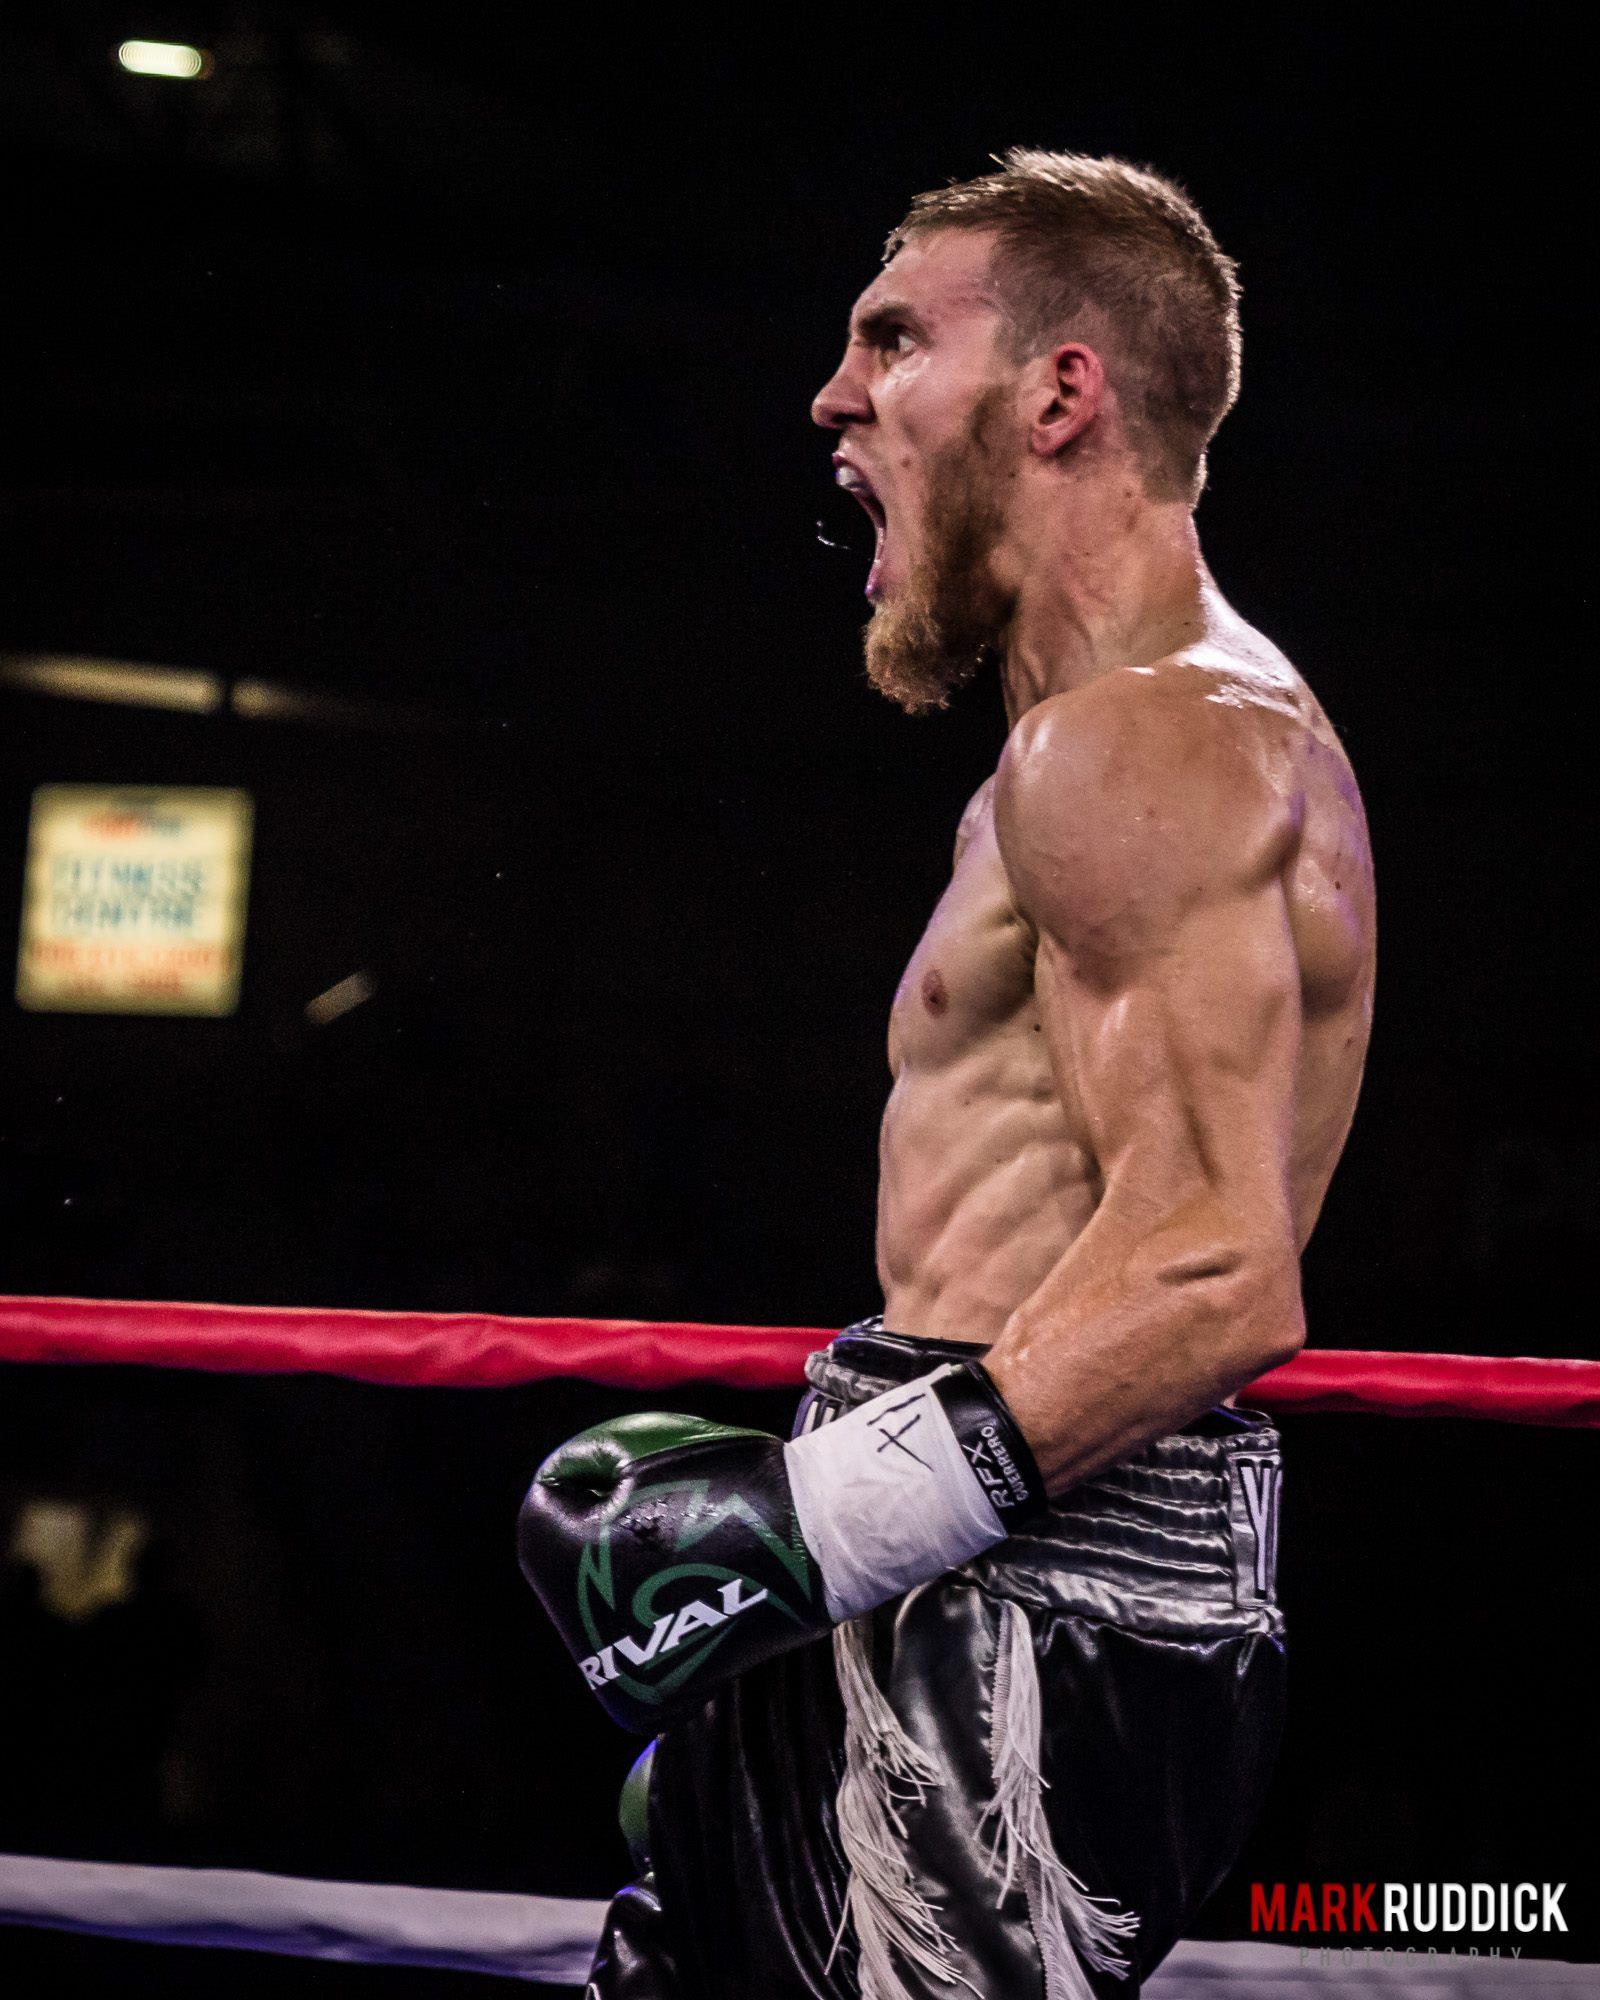 Ryan Young - NCC Canadian Champion